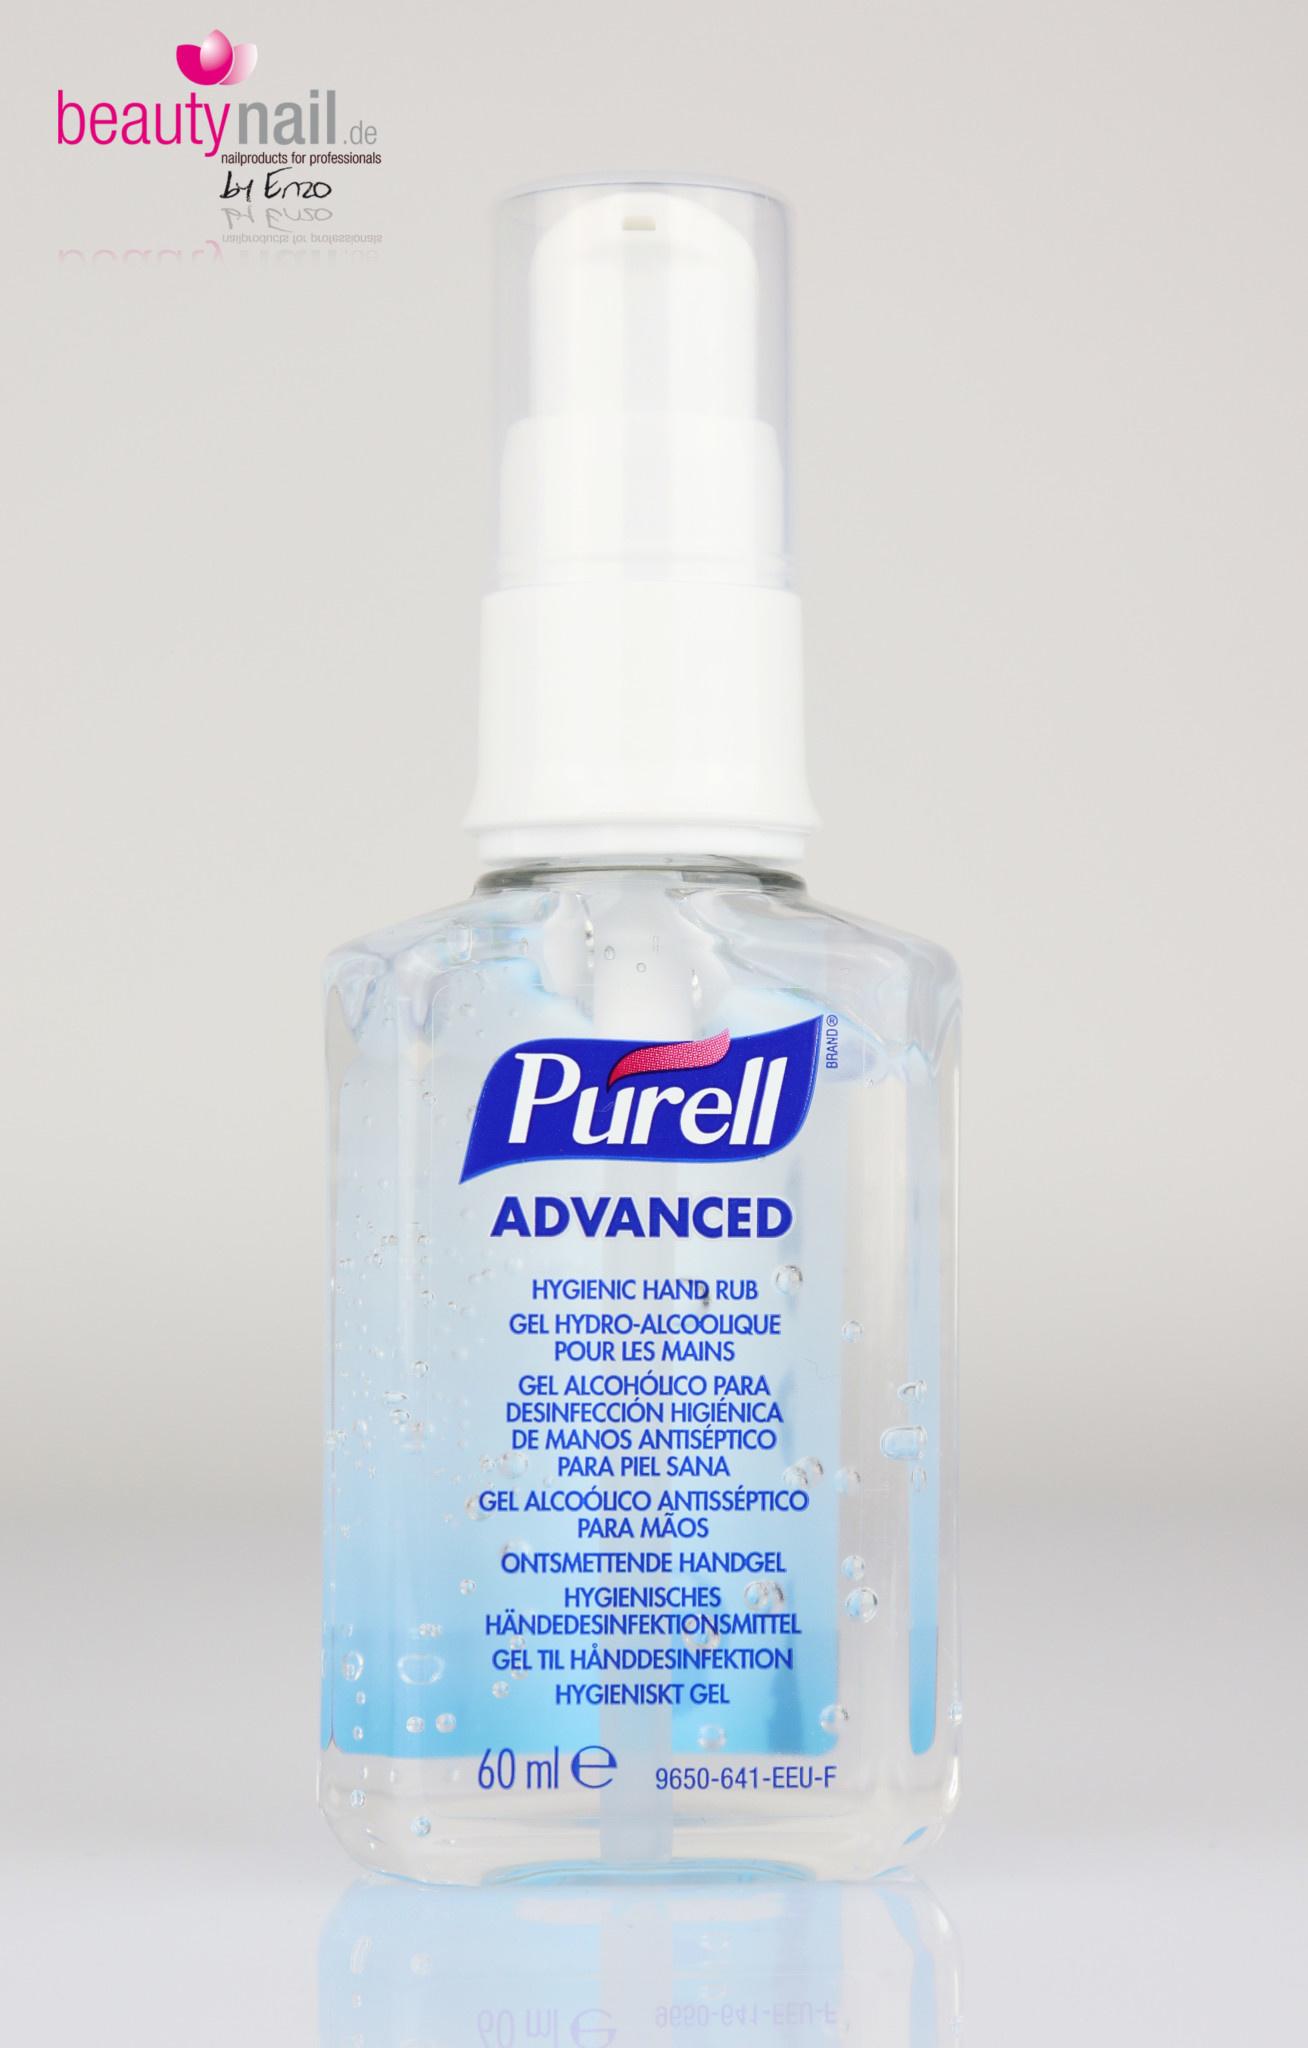 Purell - Ontsmettende handgel-1